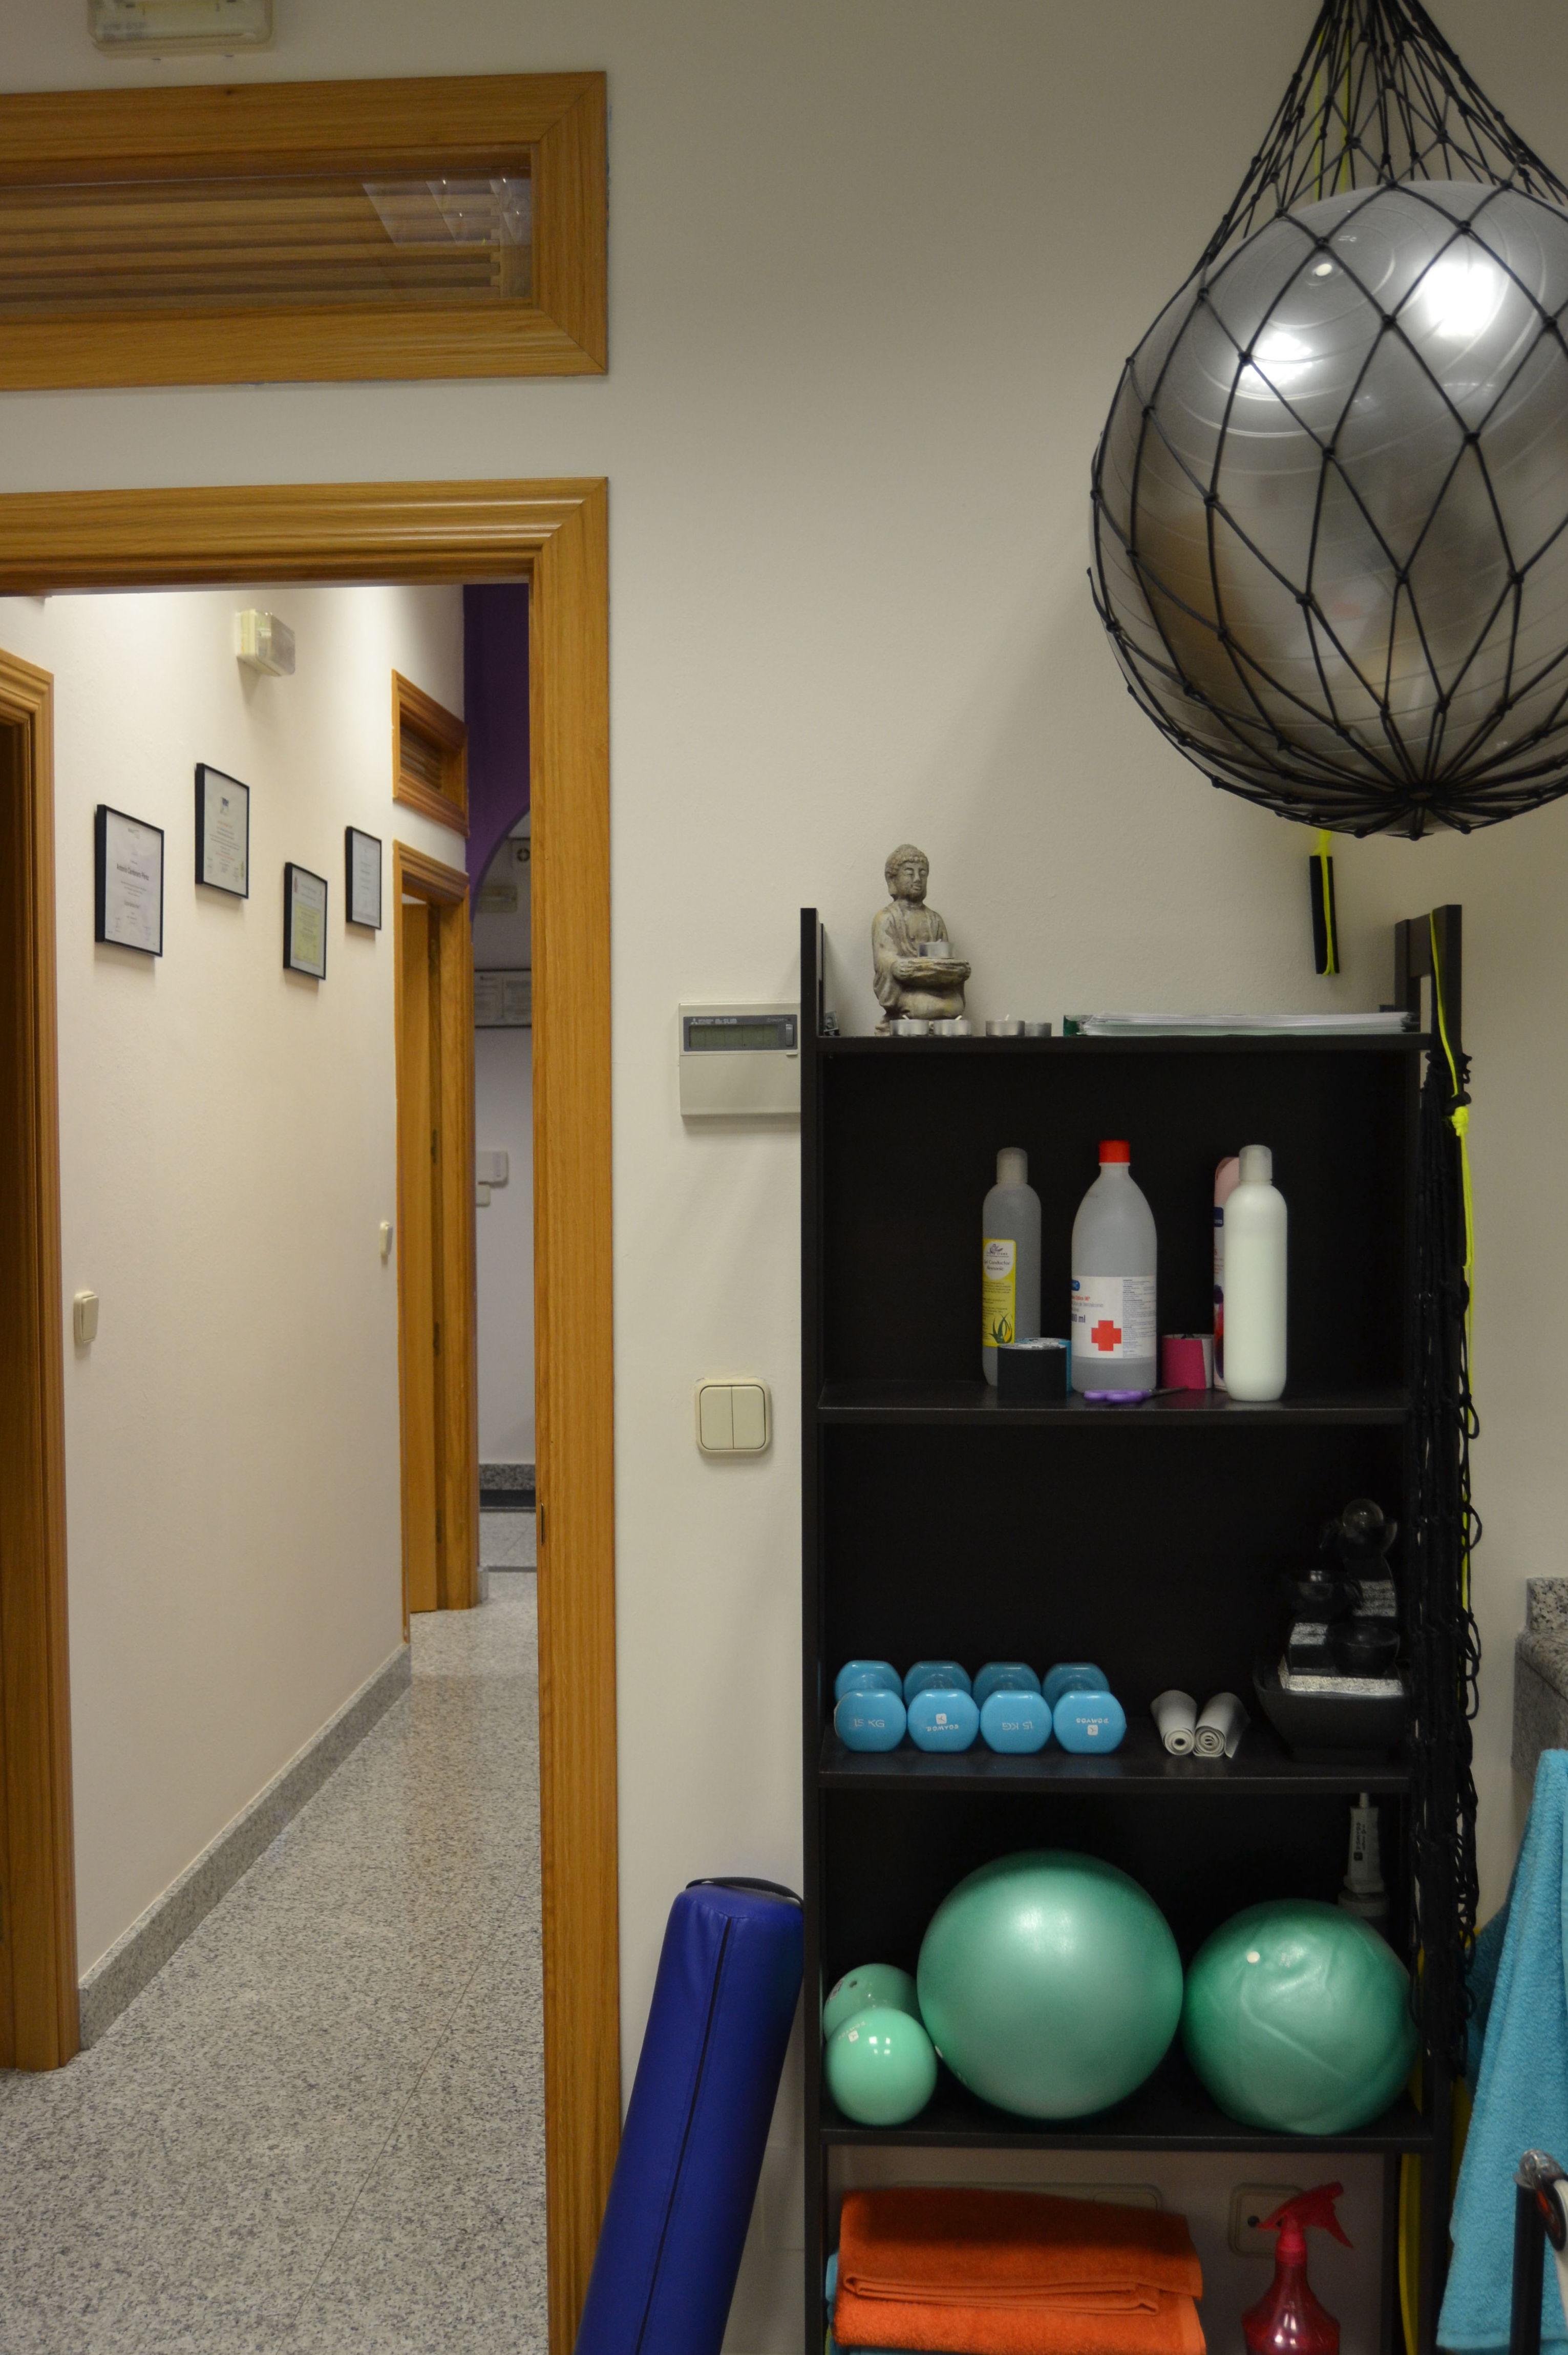 Beneficios del método pilates: Fisioterapia/Pilates de Fisioterapia Cuídate